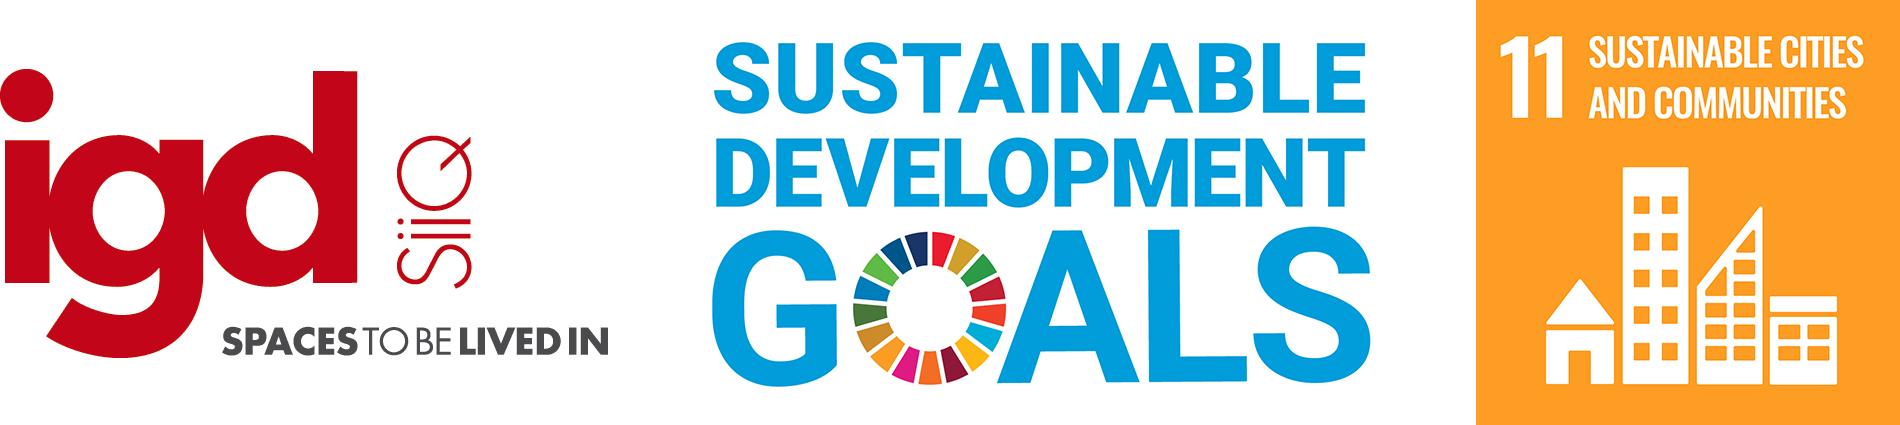 SDG_IGD_eng_11